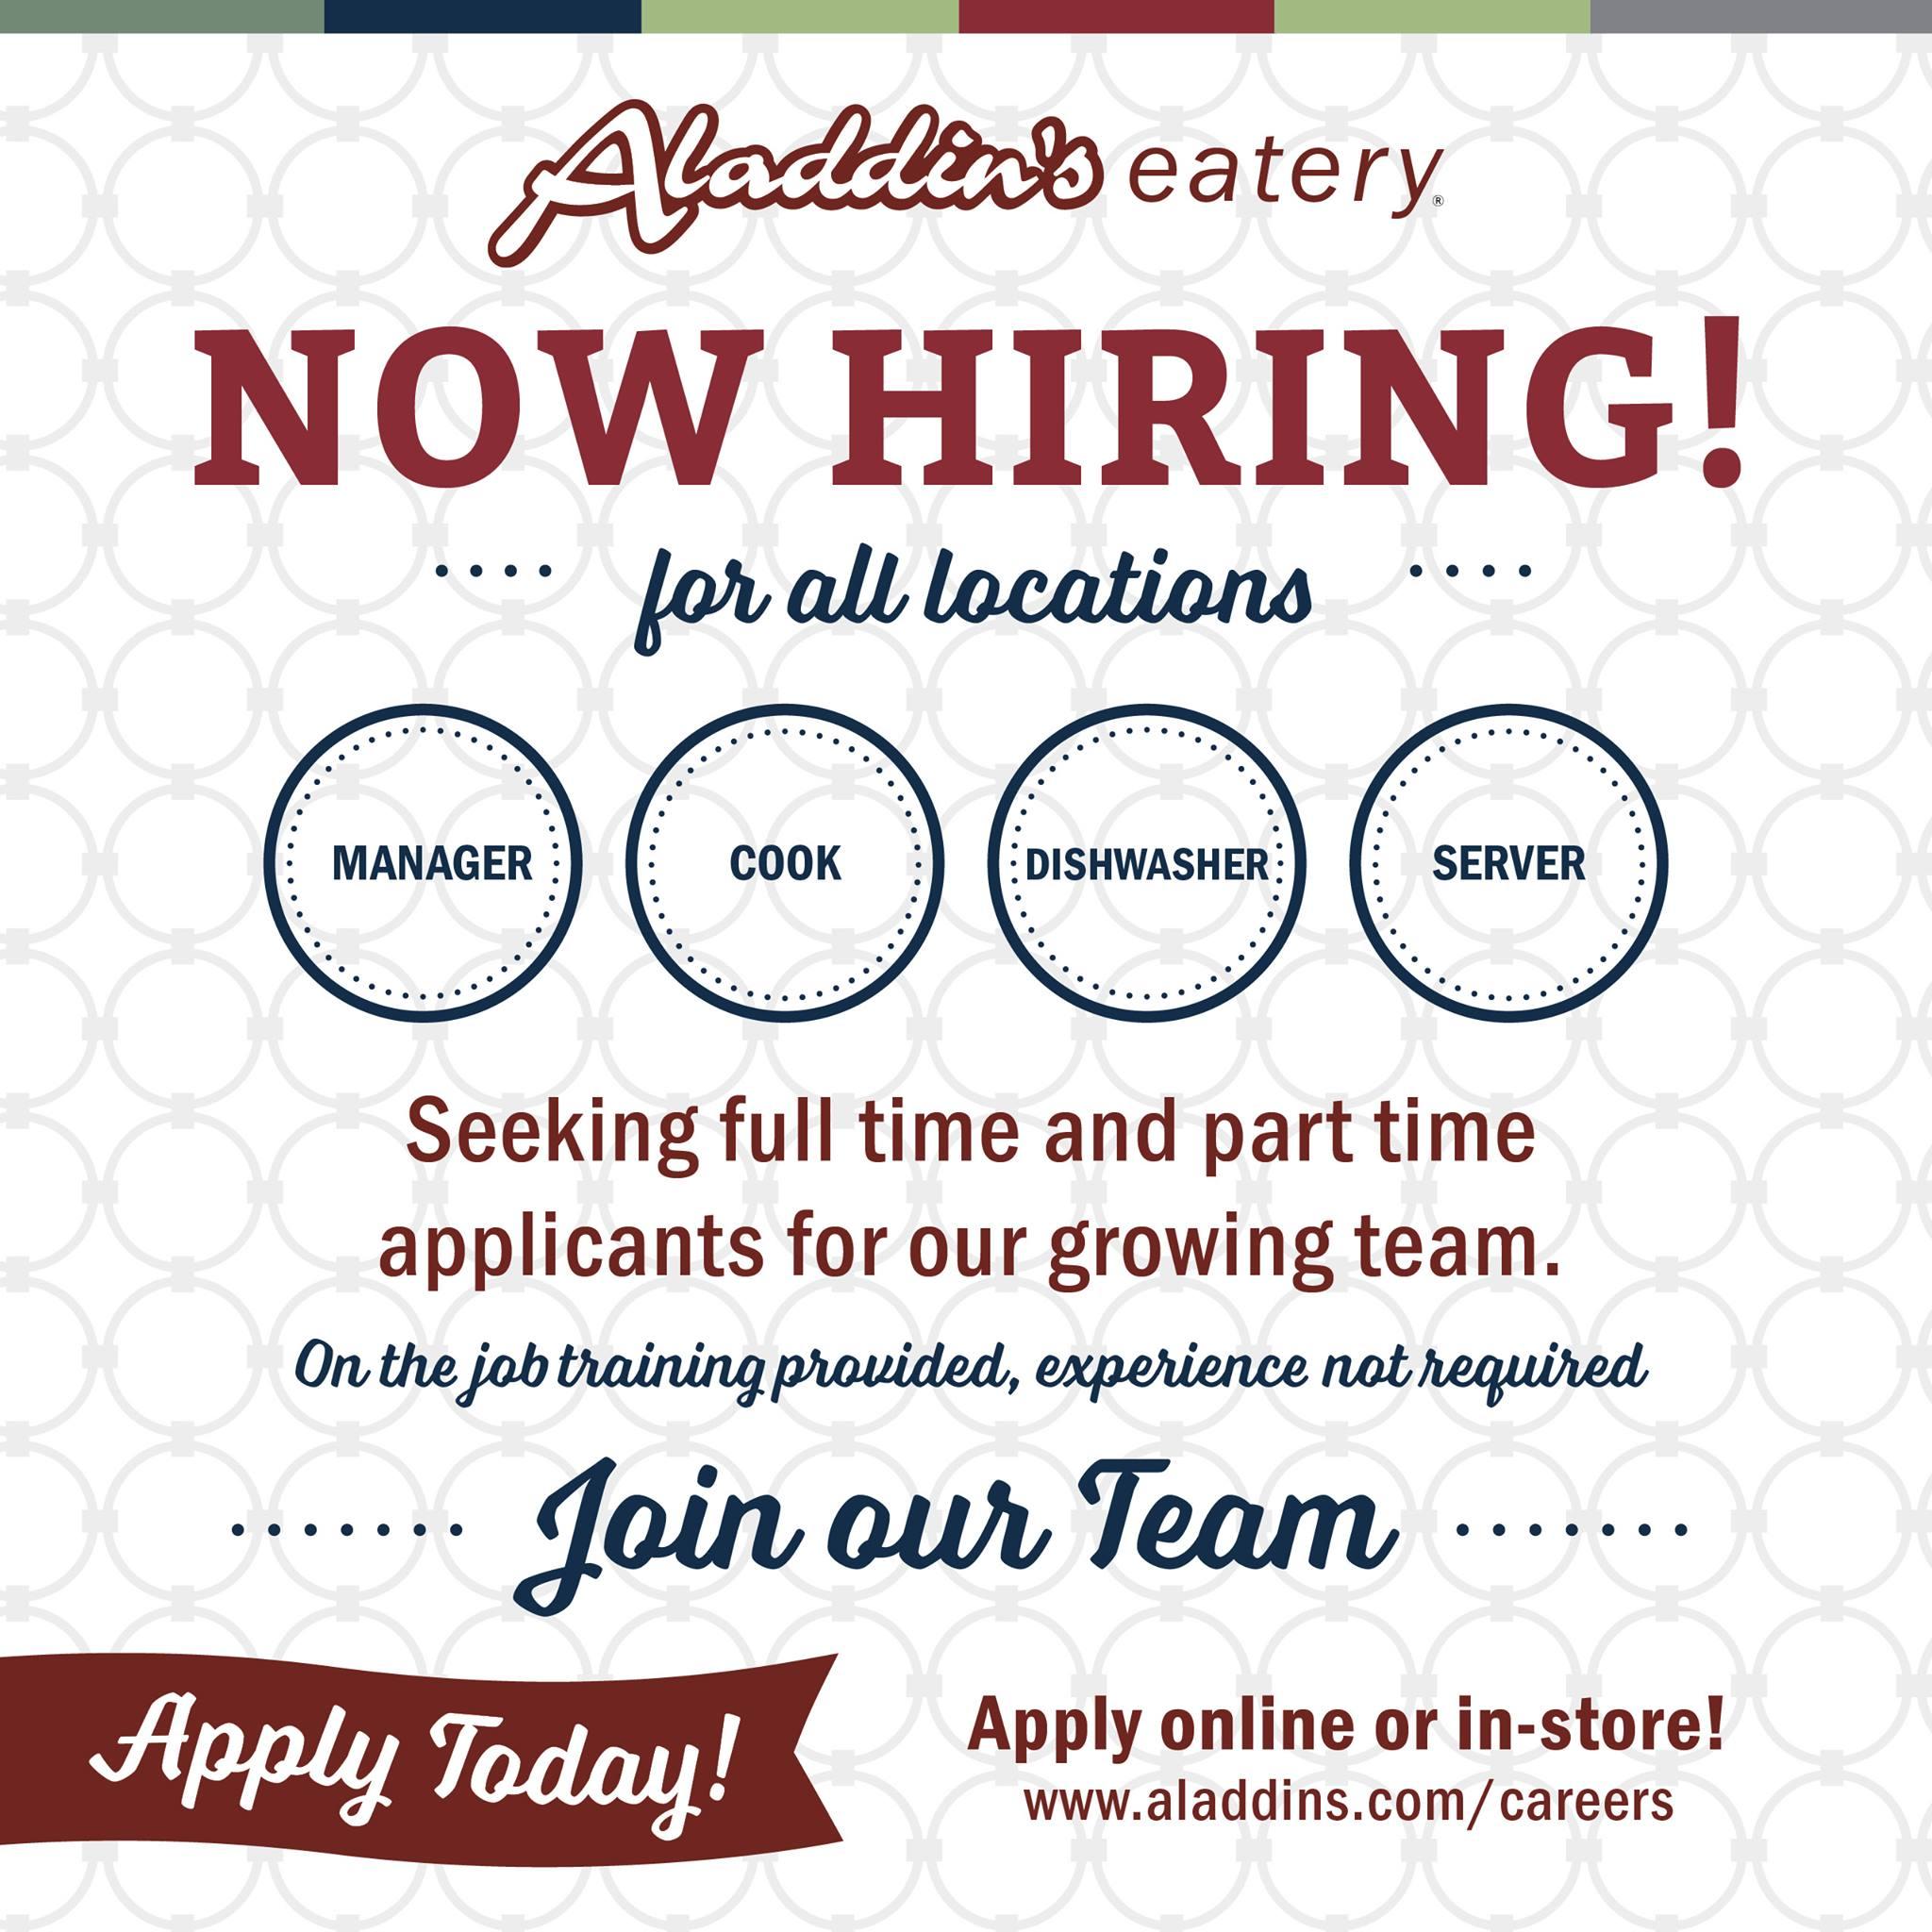 Start a Career at Aladdin's Eatery